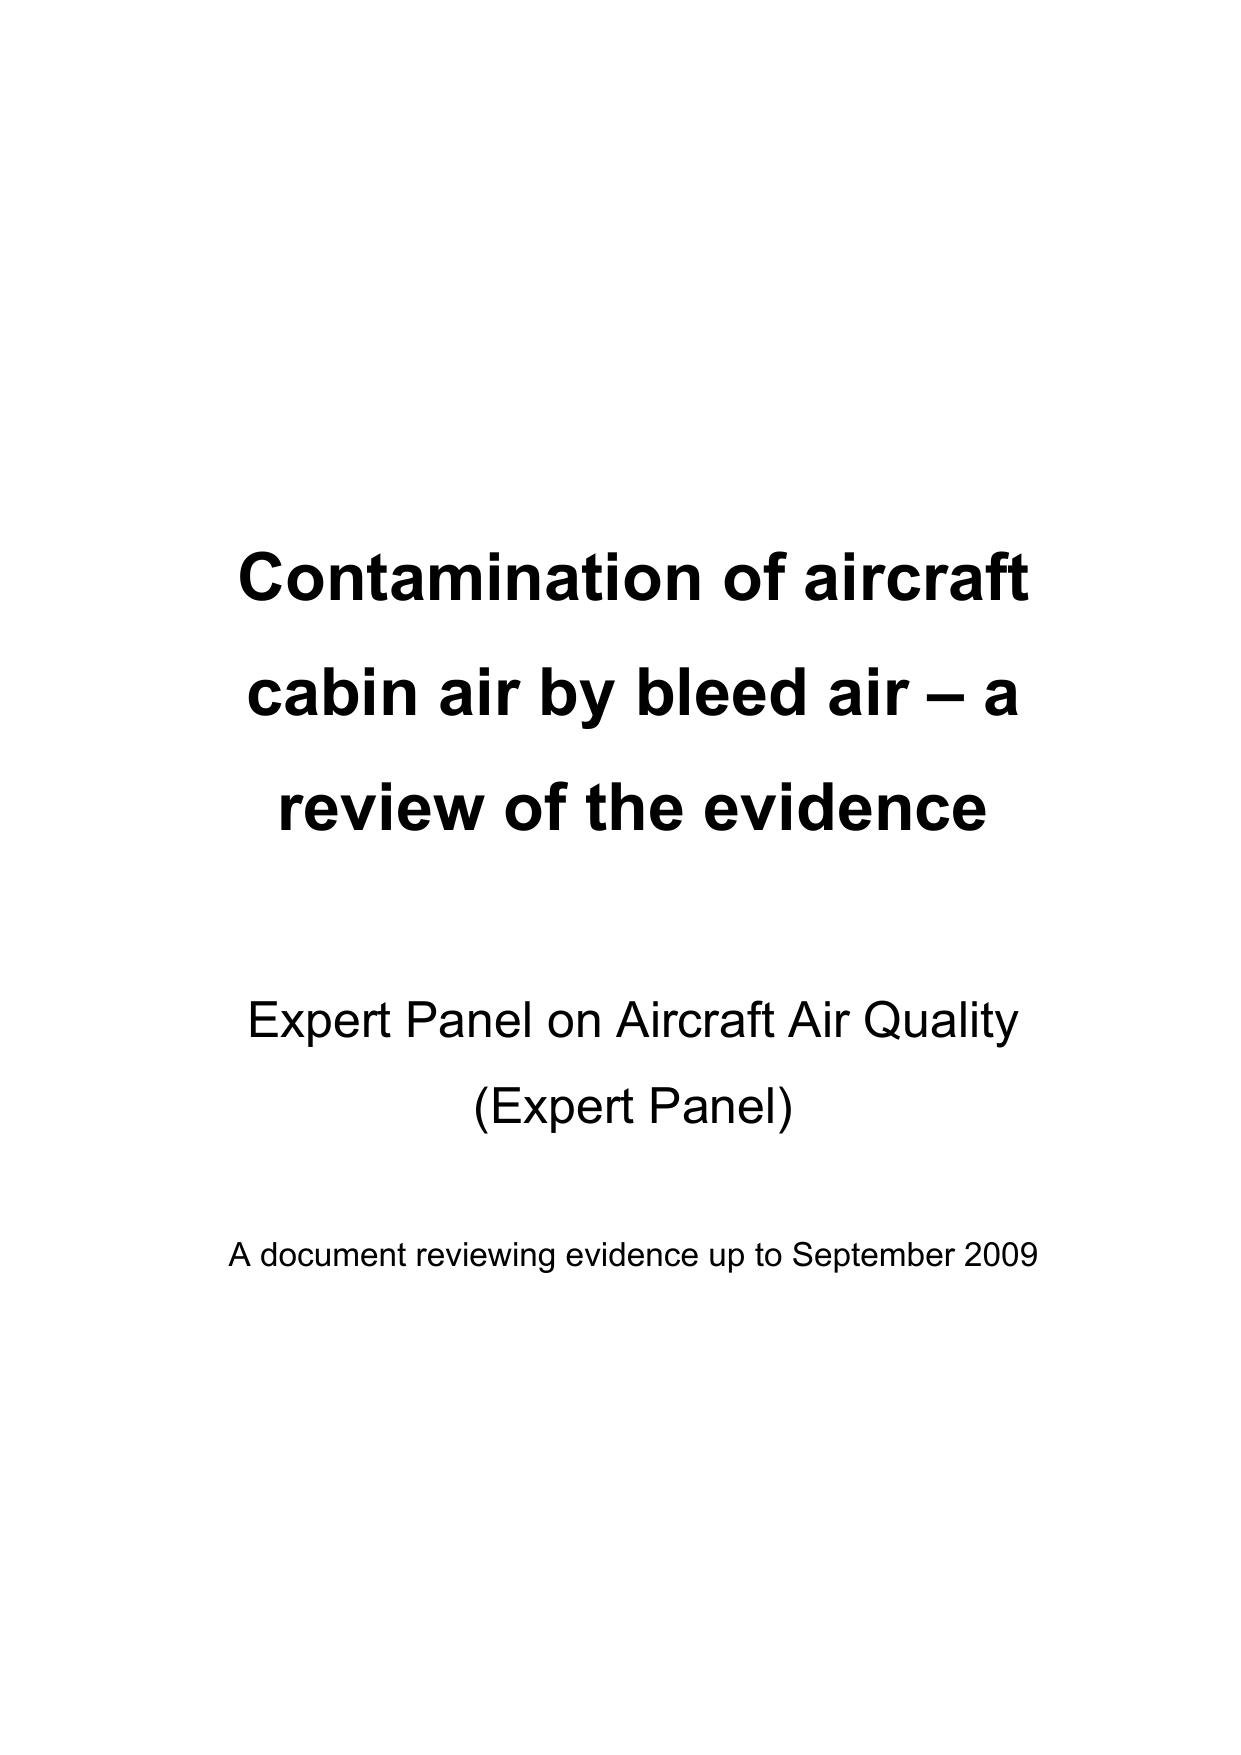 contamination of aircraft cabin air by bleed air